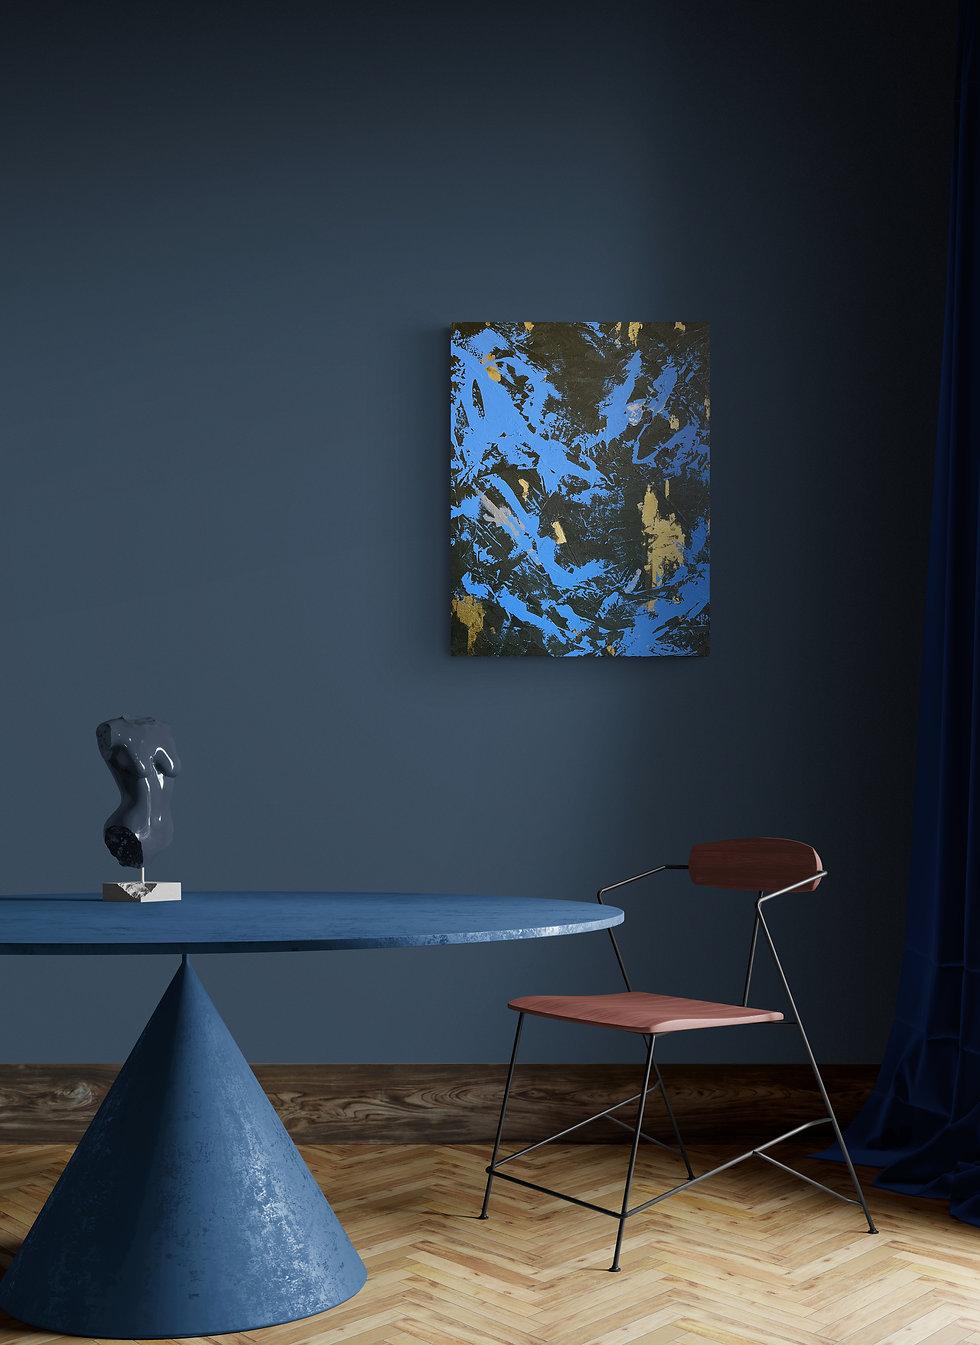 Stylish_room_interior_with_dramatic_lighting (2).jpg